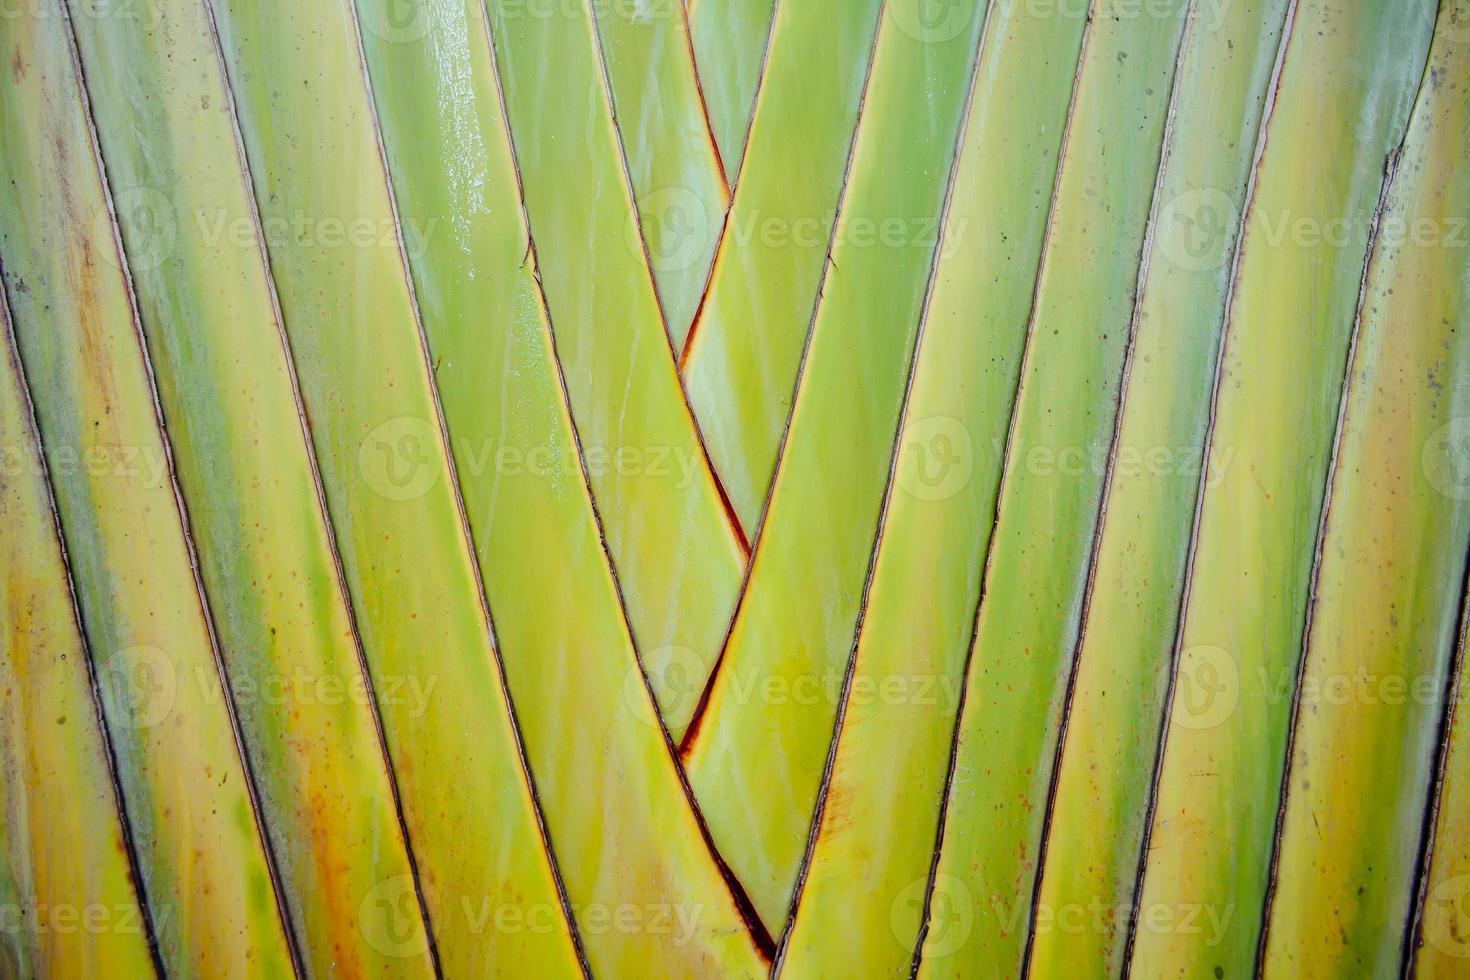 patroon van stengels palm uitgelijnd in rijen foto